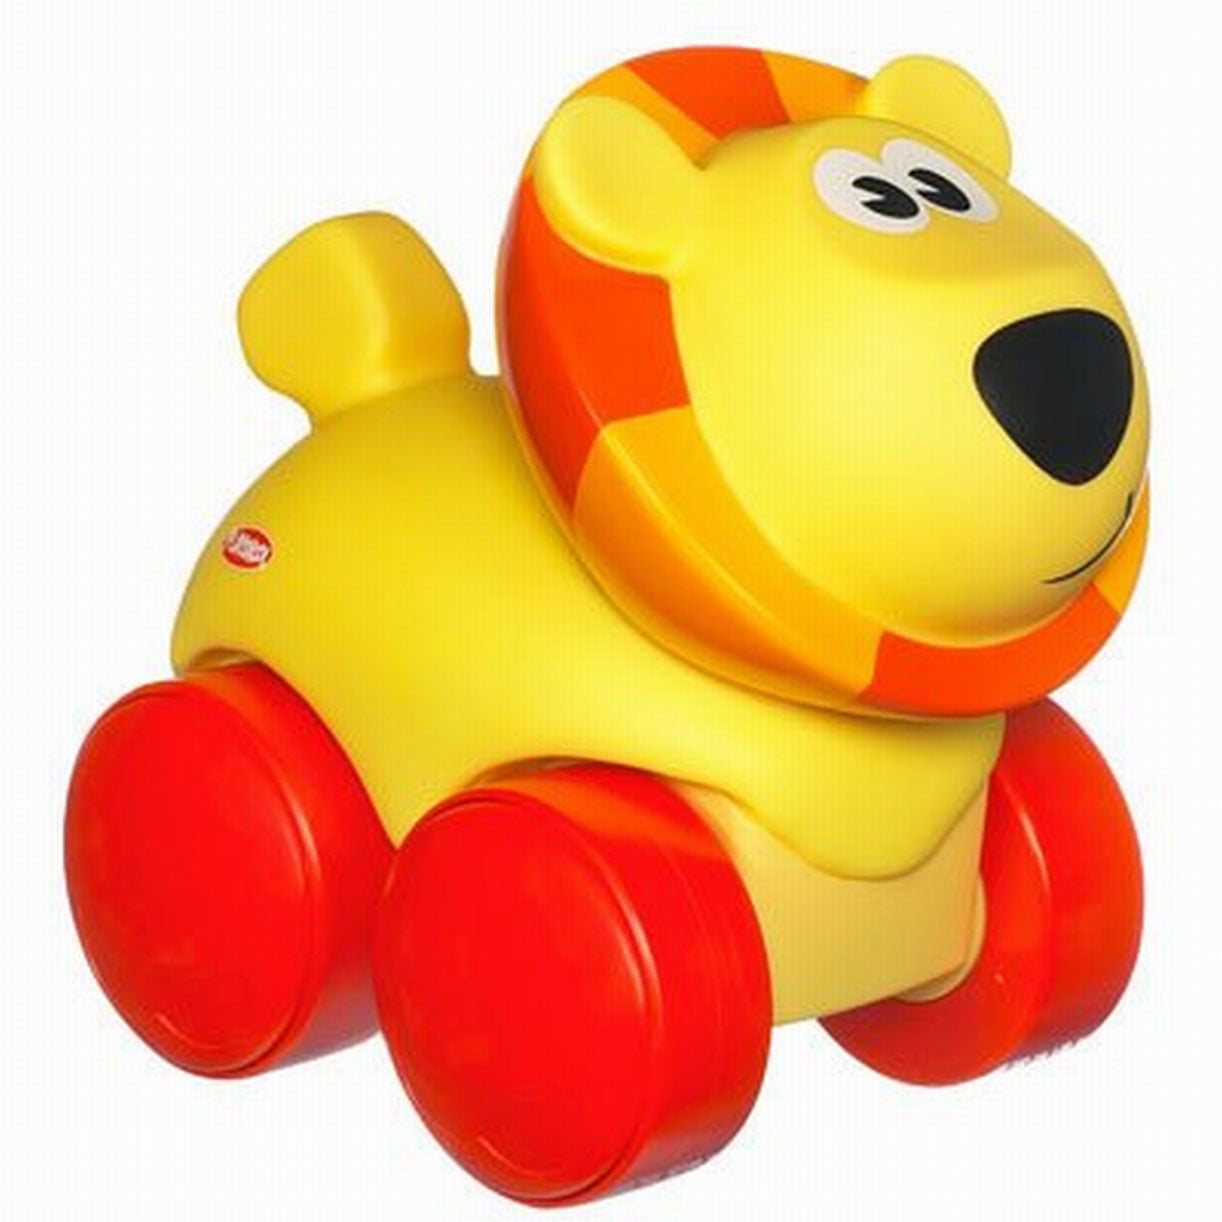 Playskool Wheel Pals Animal Tracks Squishy Critter Lion by Hasbro